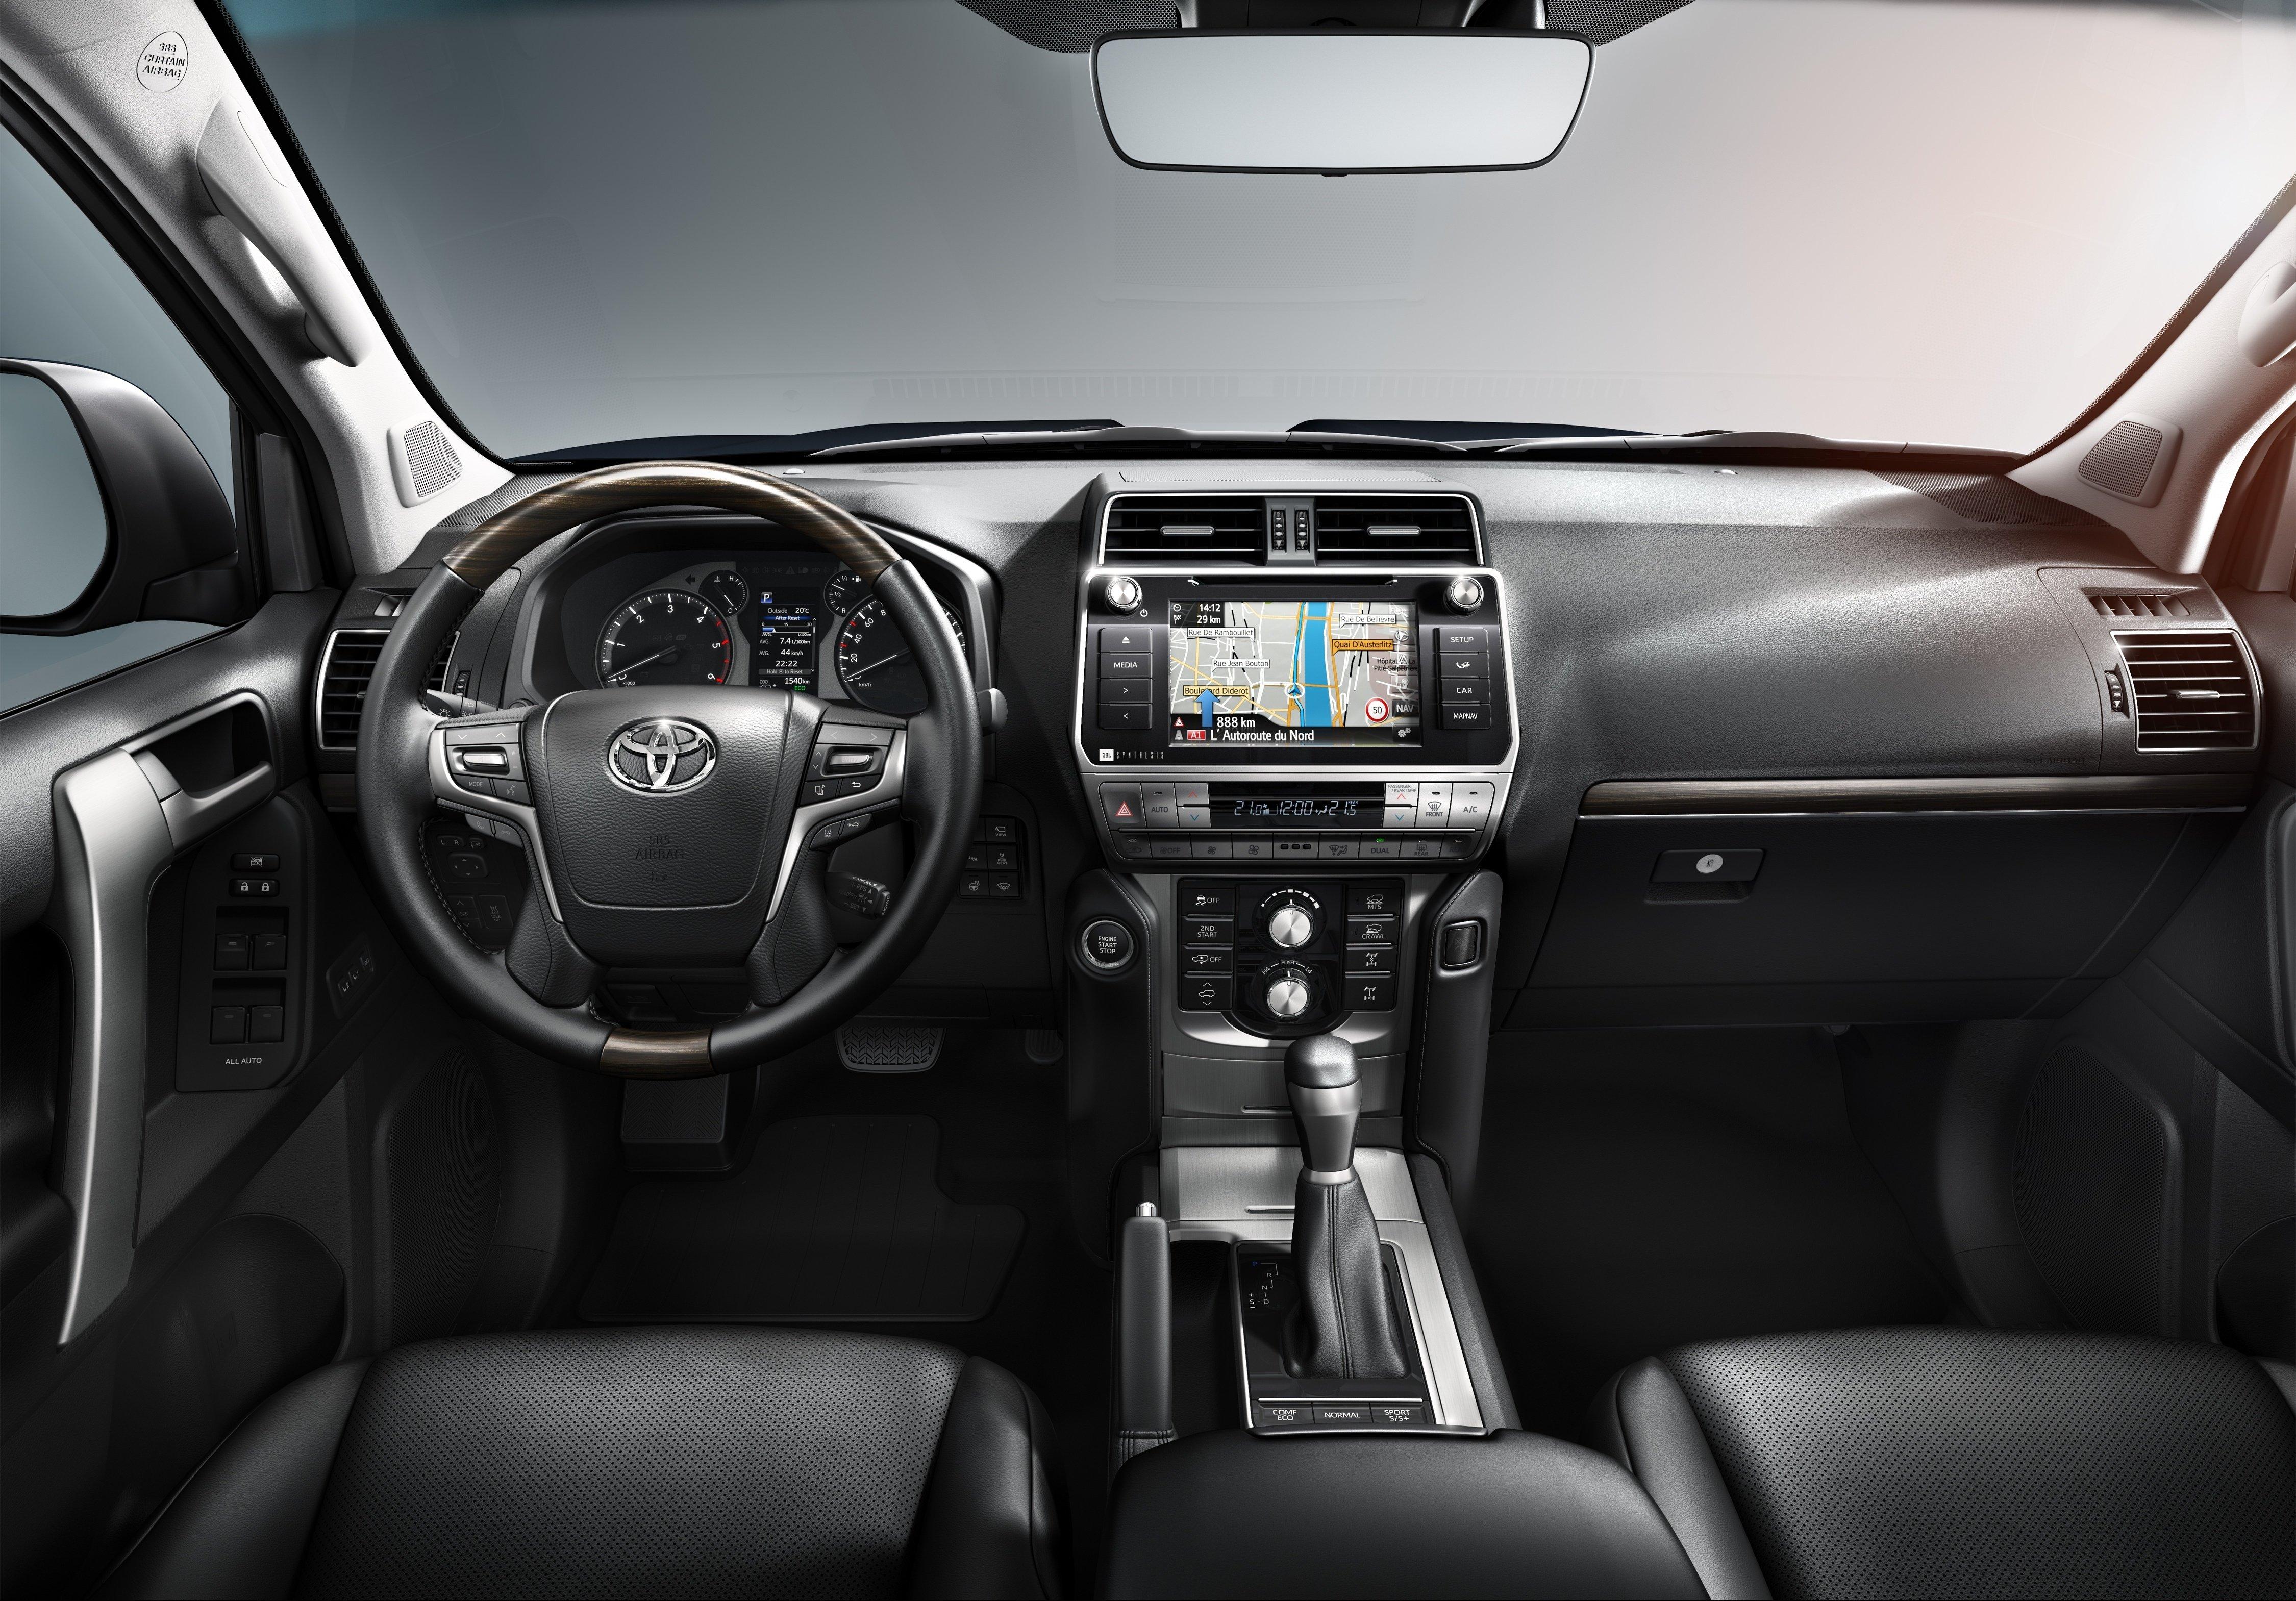 2018 Toyota Land Cruiser Prado facelift unveiled Image 709654